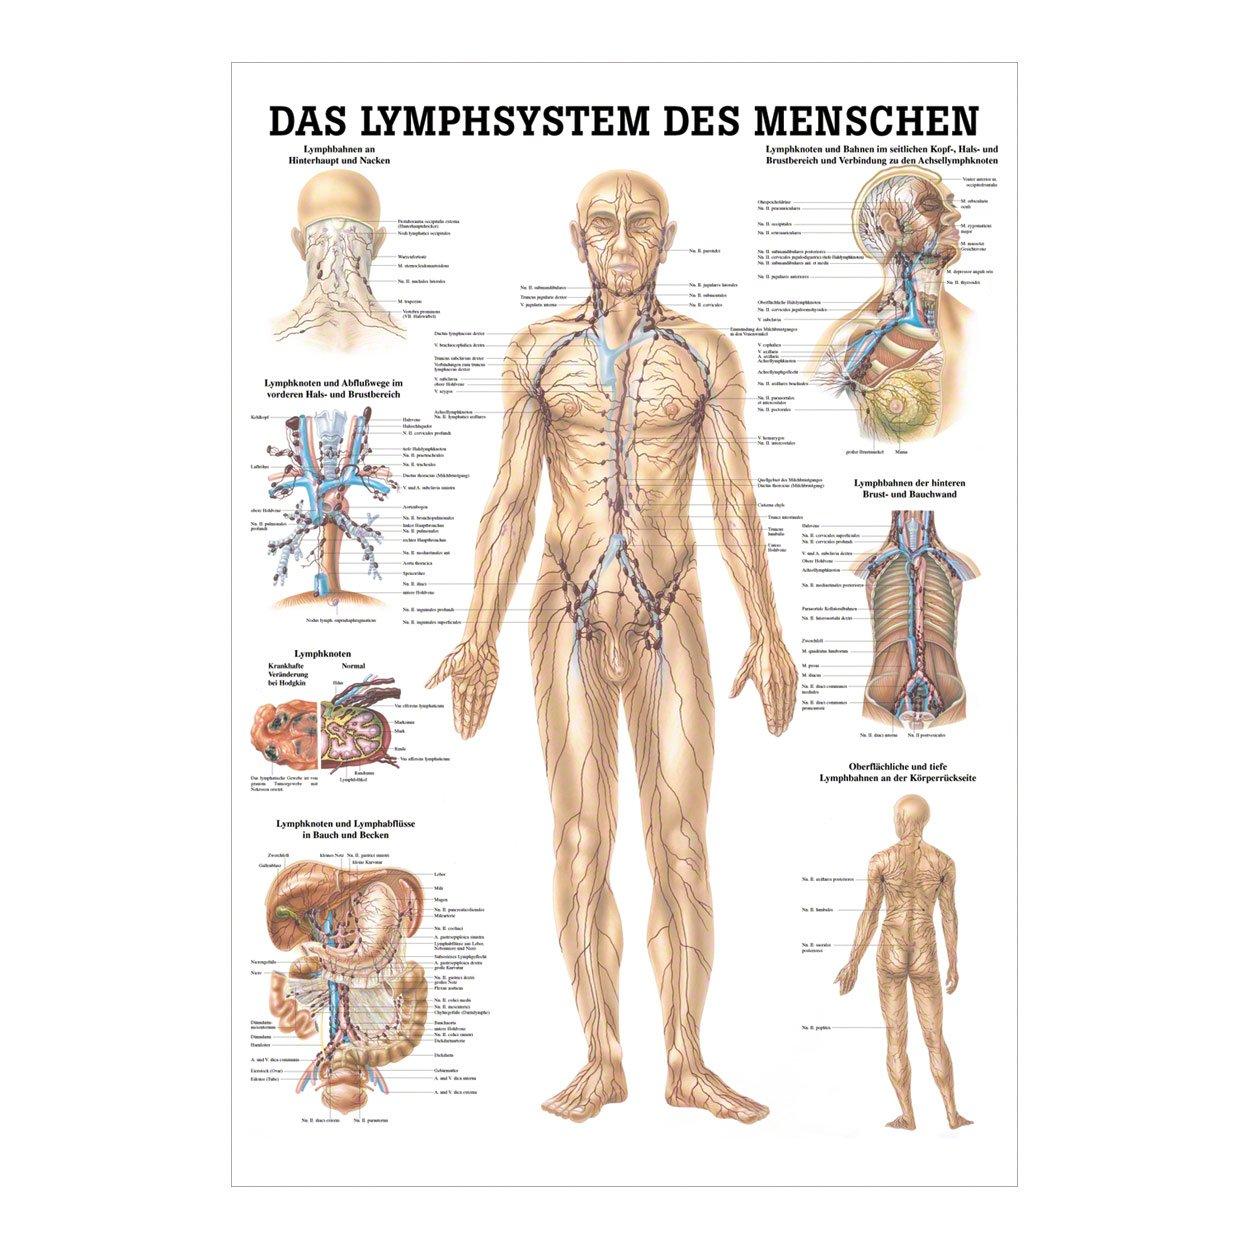 Nett Hals Dreieck Anatomie Galerie - Anatomie Ideen - finotti.info